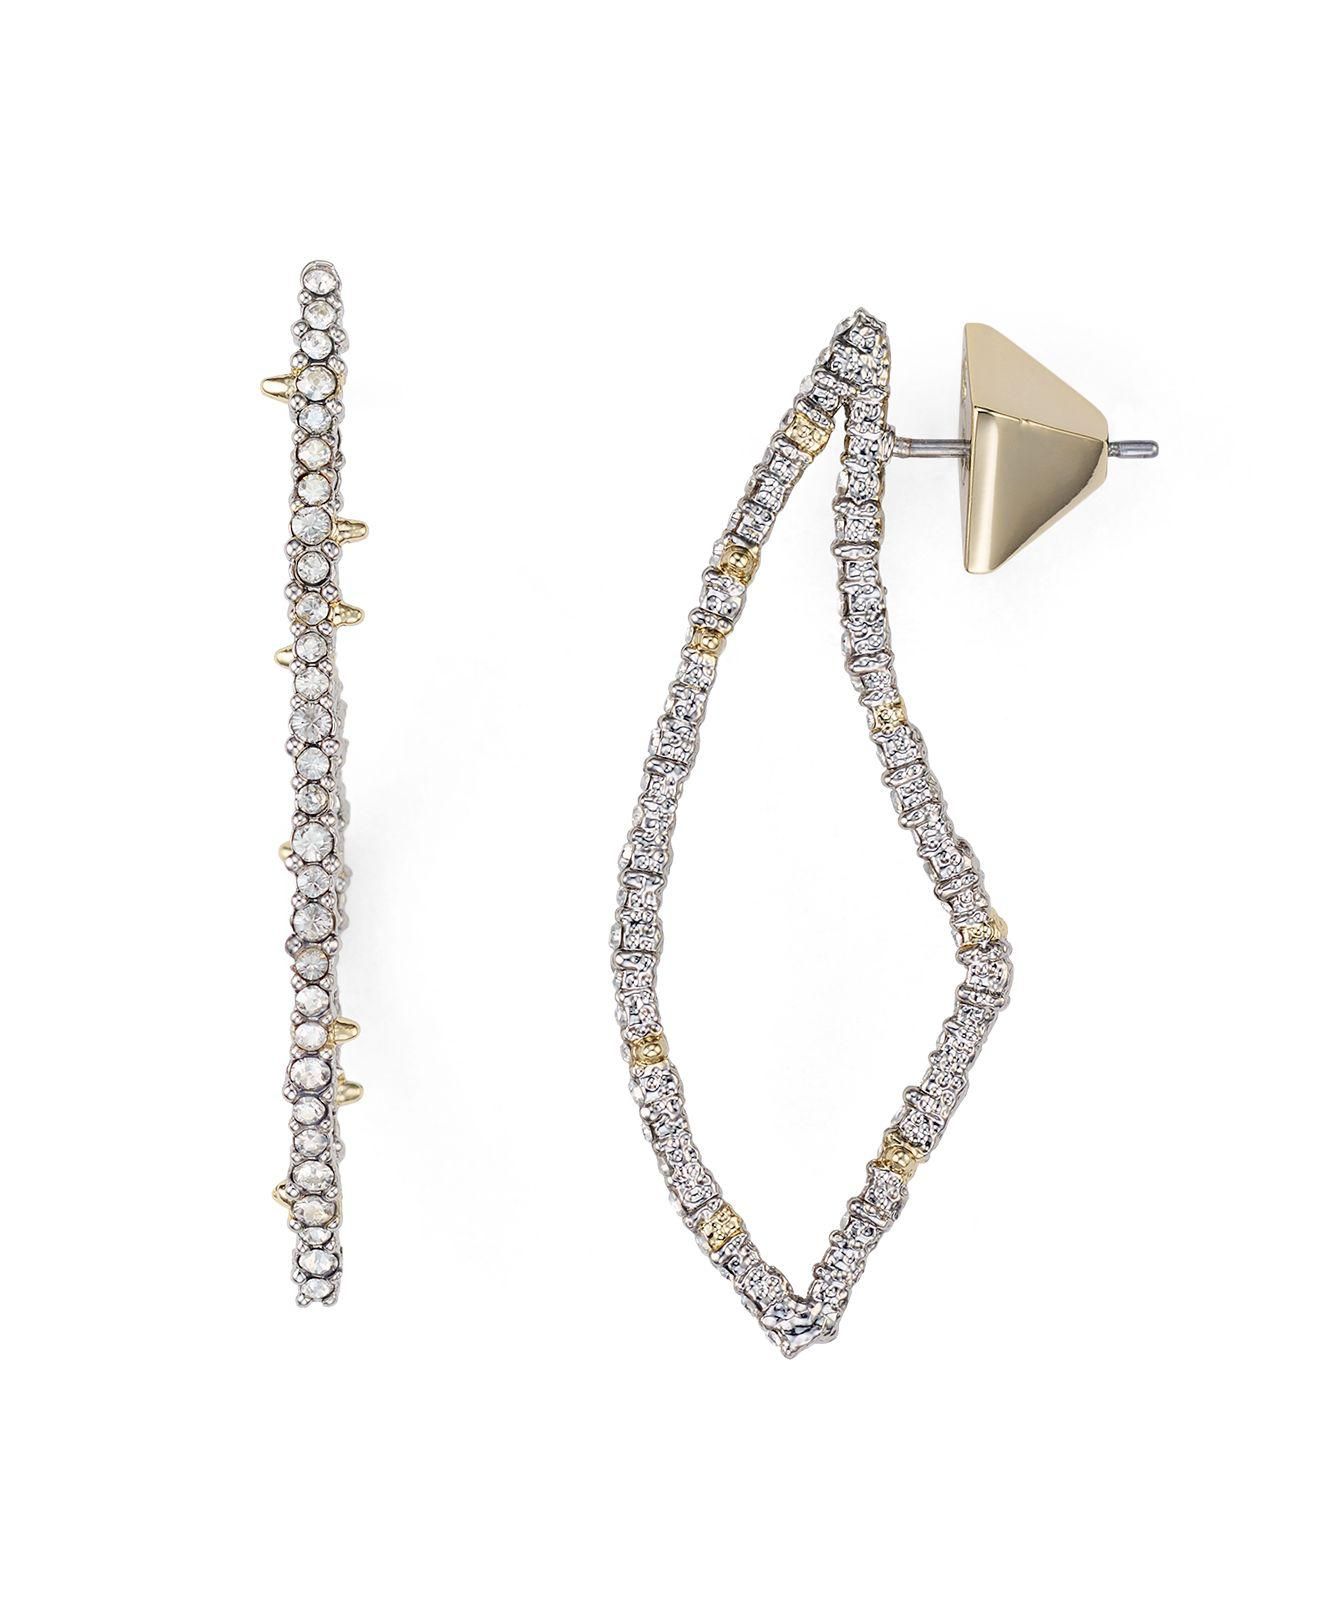 Alexis Bittar Pavé Crystal-Encrusted Thorn Drop Earrings CIbvwZSf6